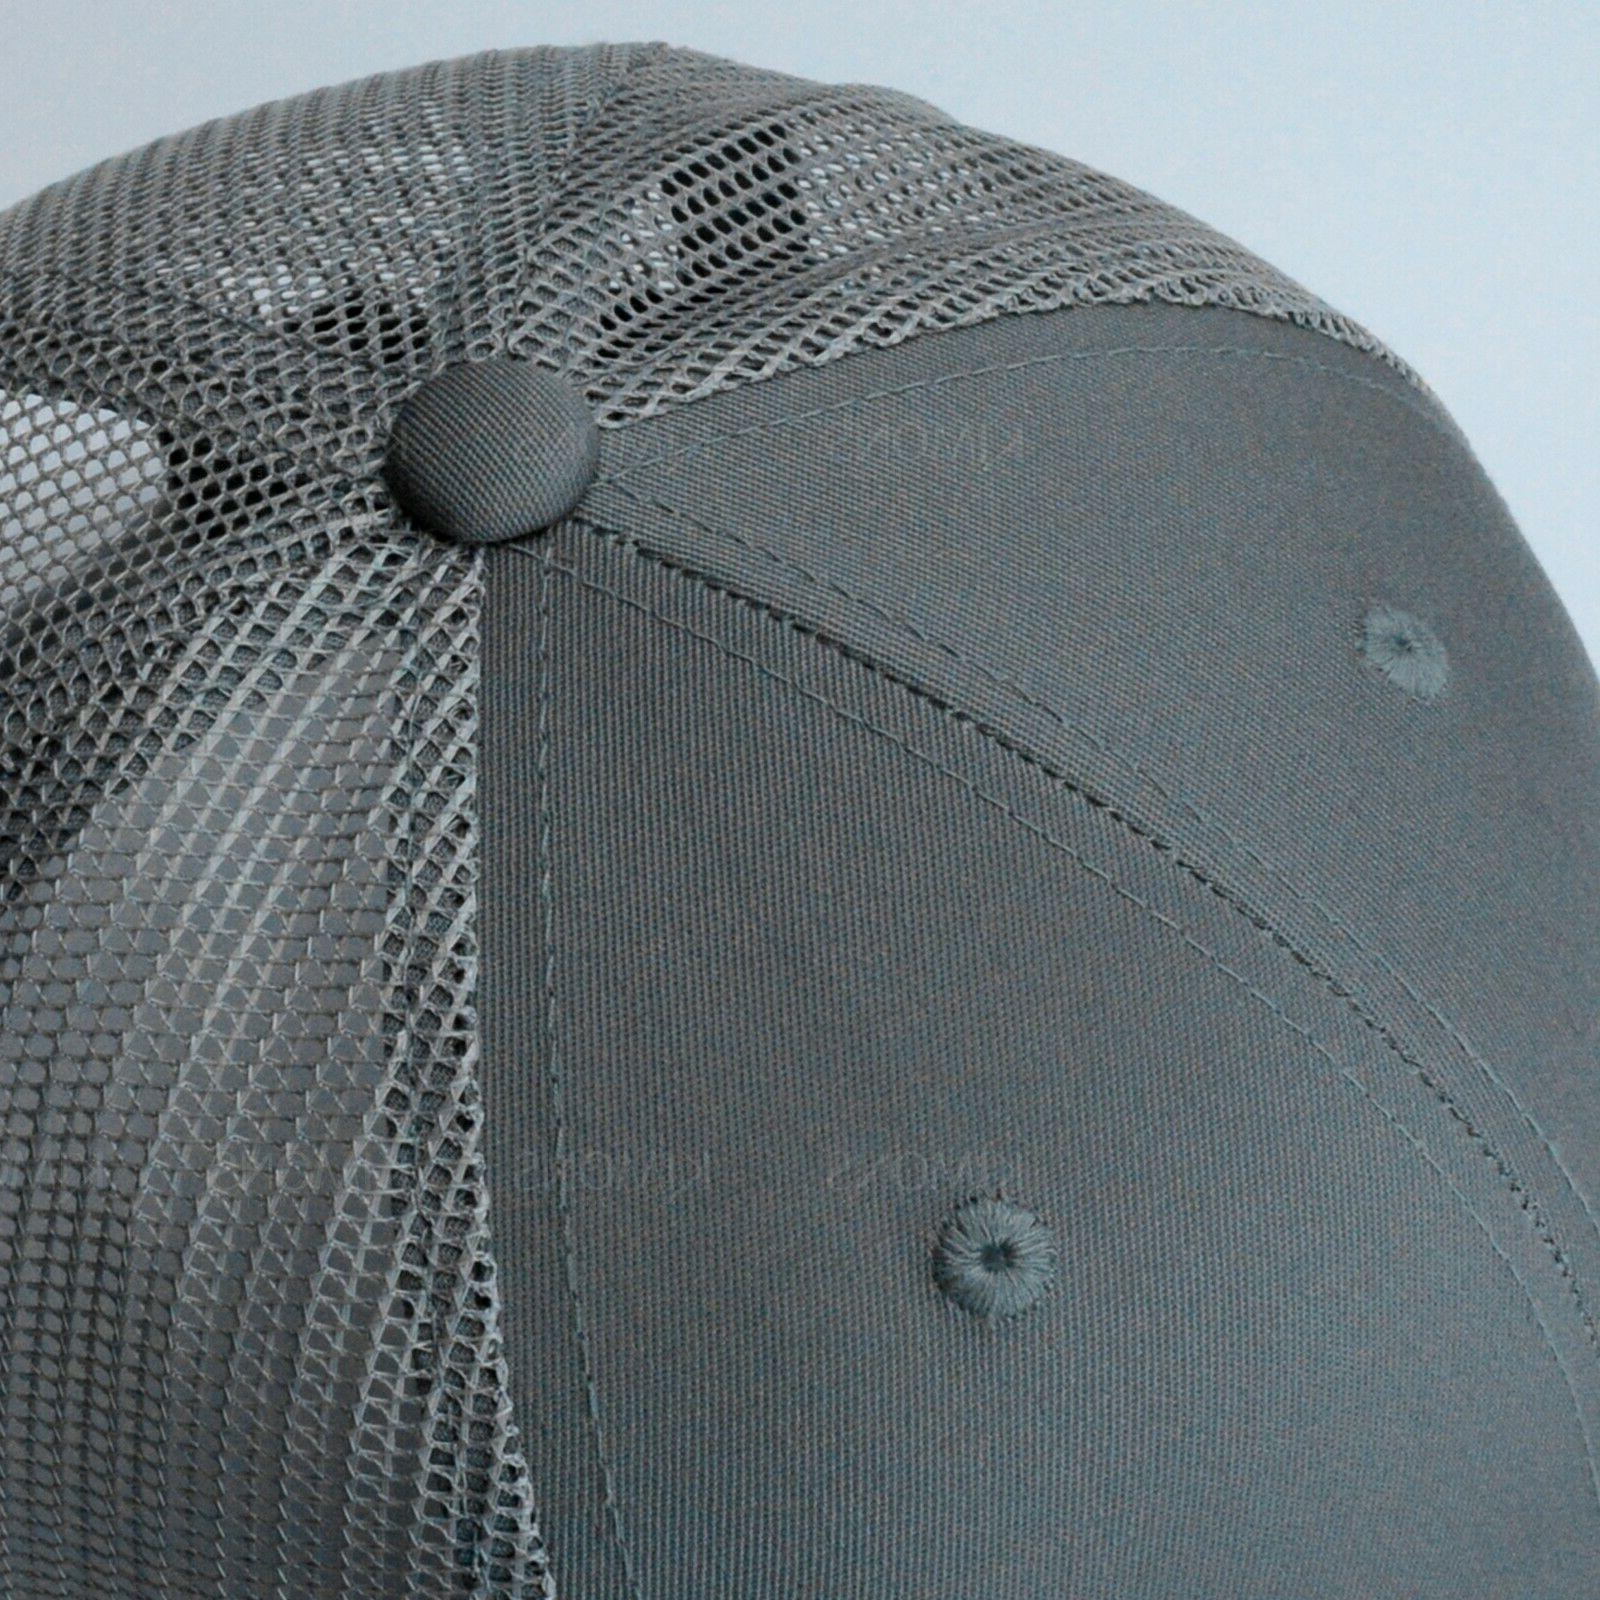 Cap Adjustable Visor Hip Mens